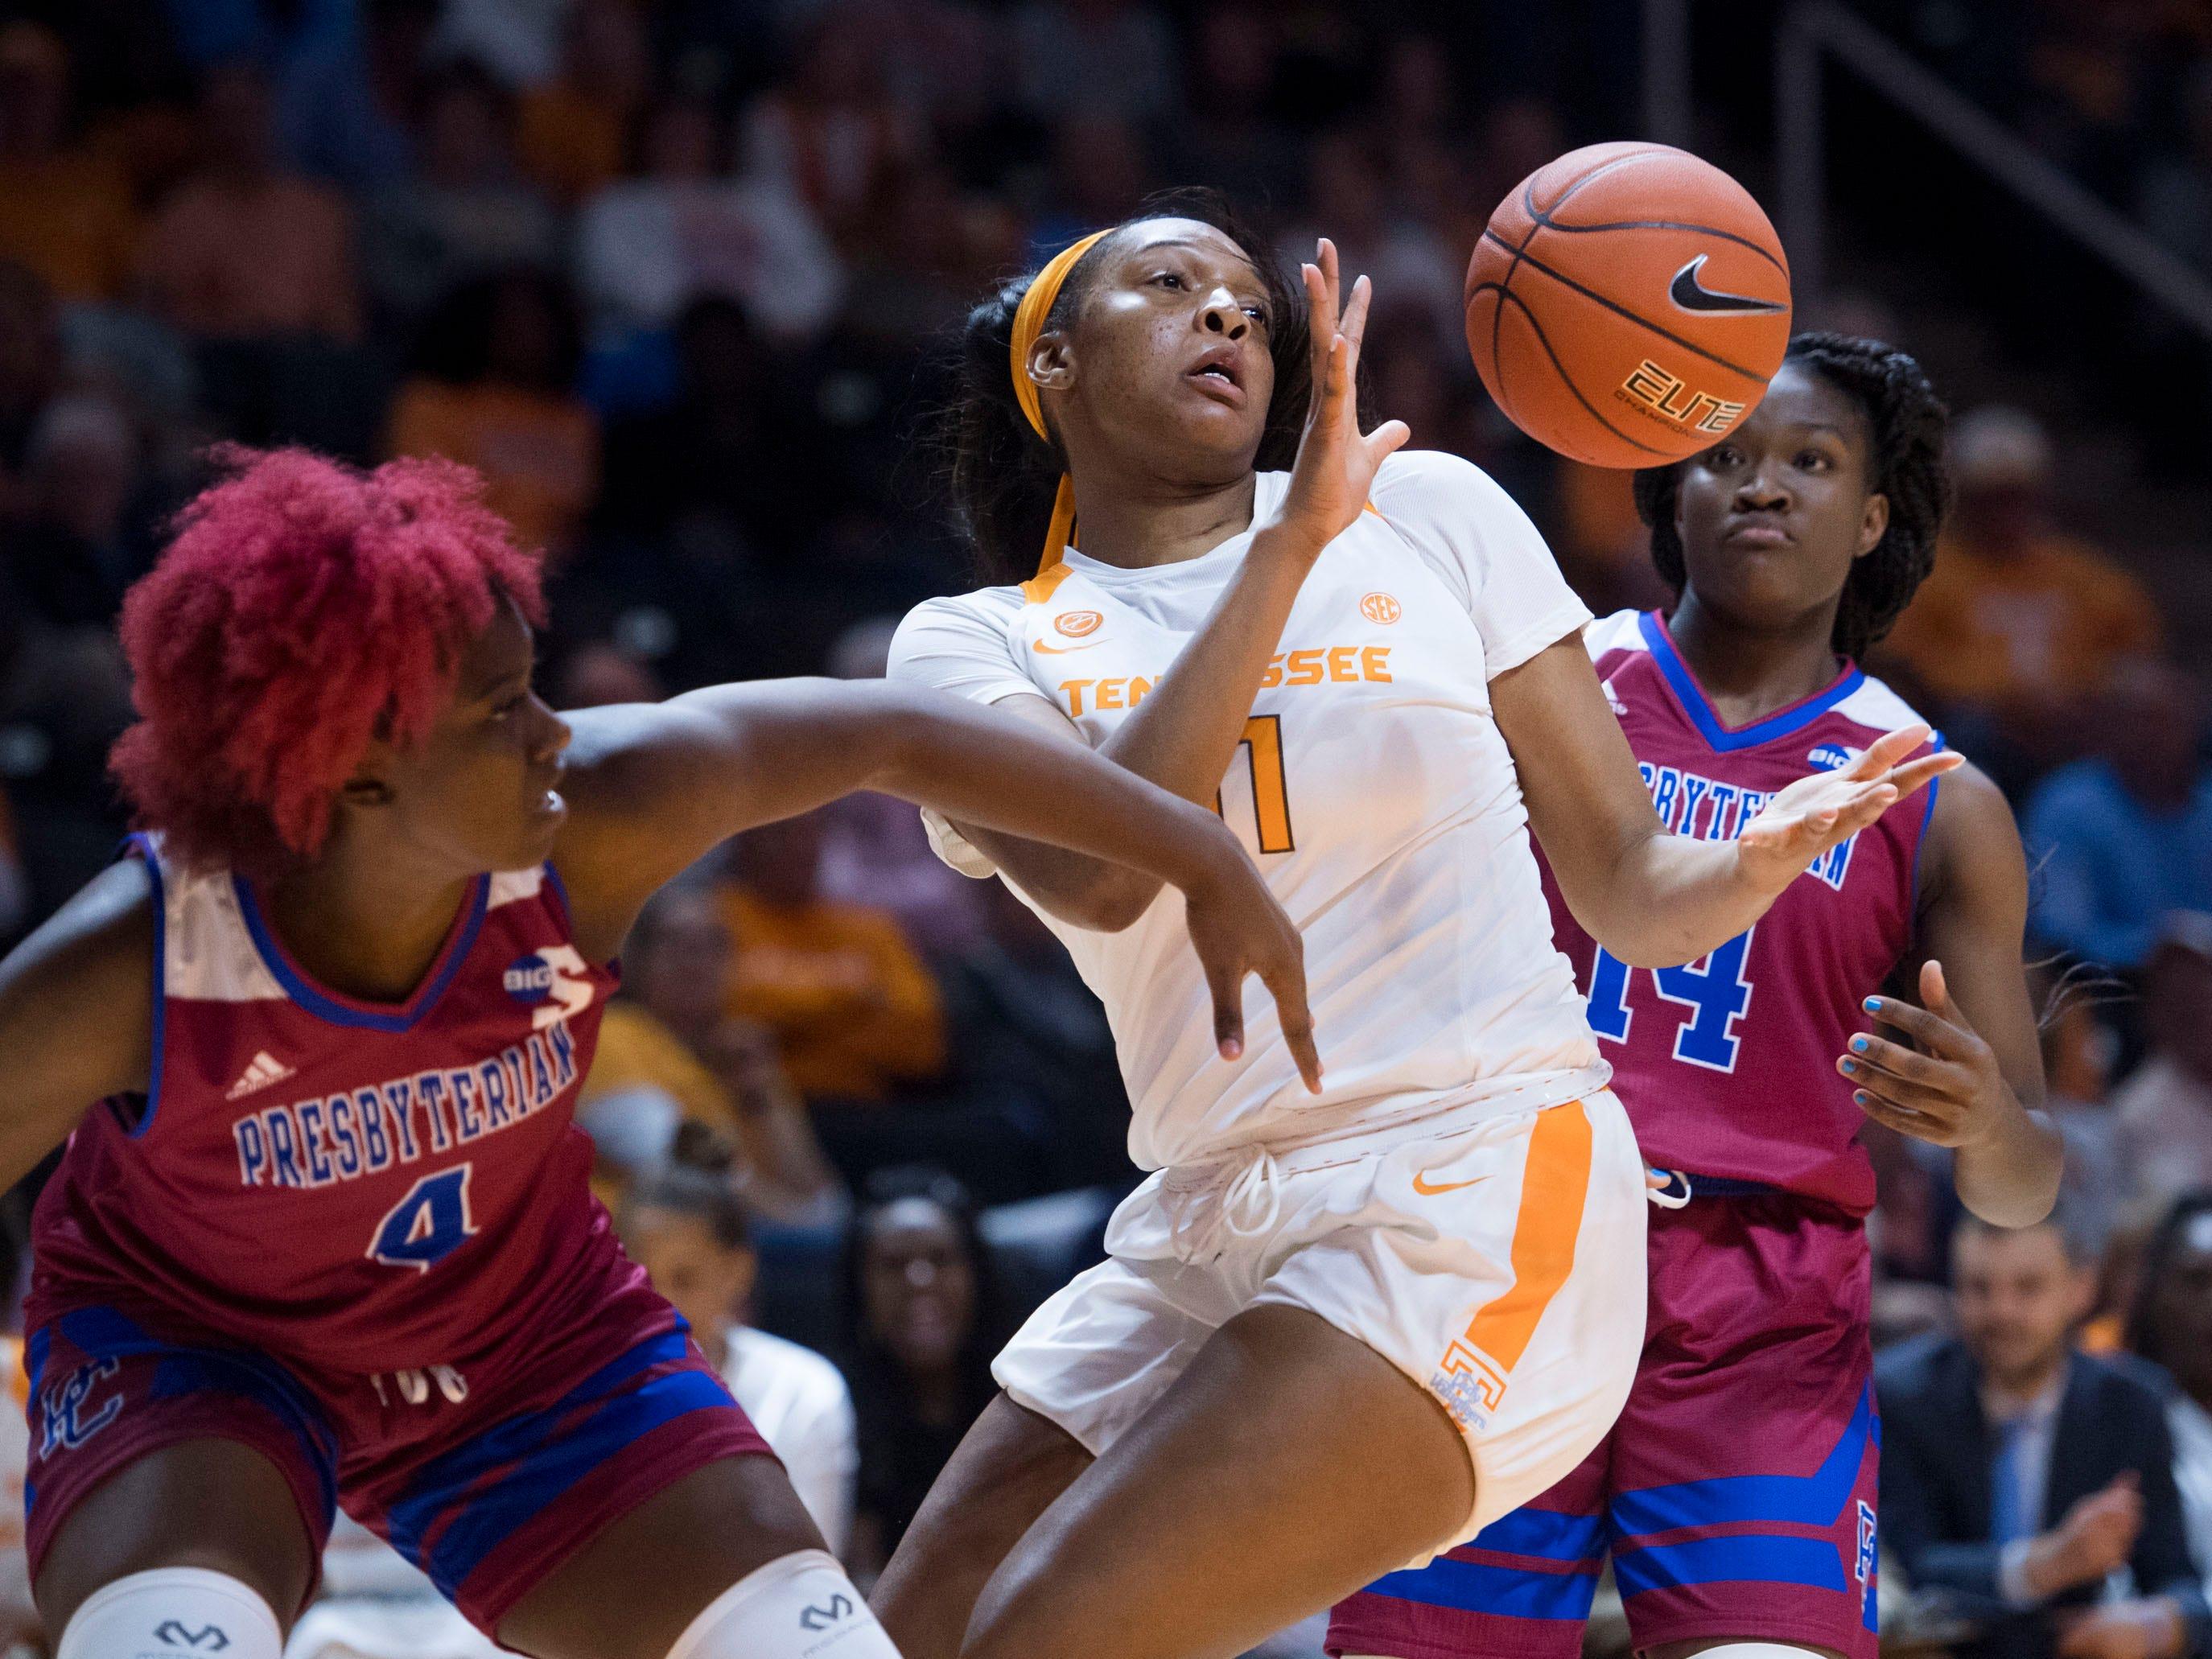 Tennessee's Kasiyahna Kushkituah (11) gets the rebound over Presbyterian on Sunday, November 11, 2018.